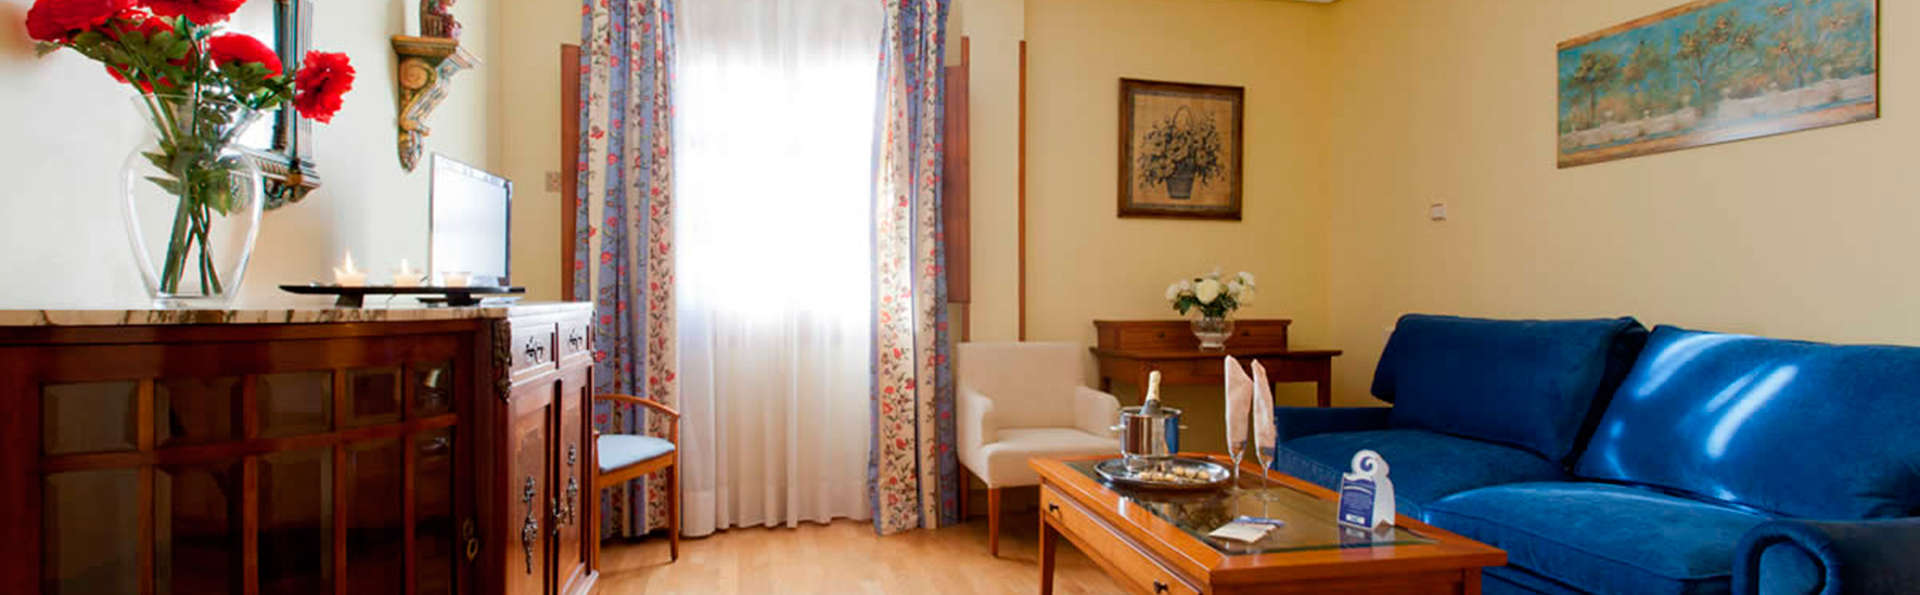 Hotel Casona de la Reyna - EDIT_juniorsuite2.jpg